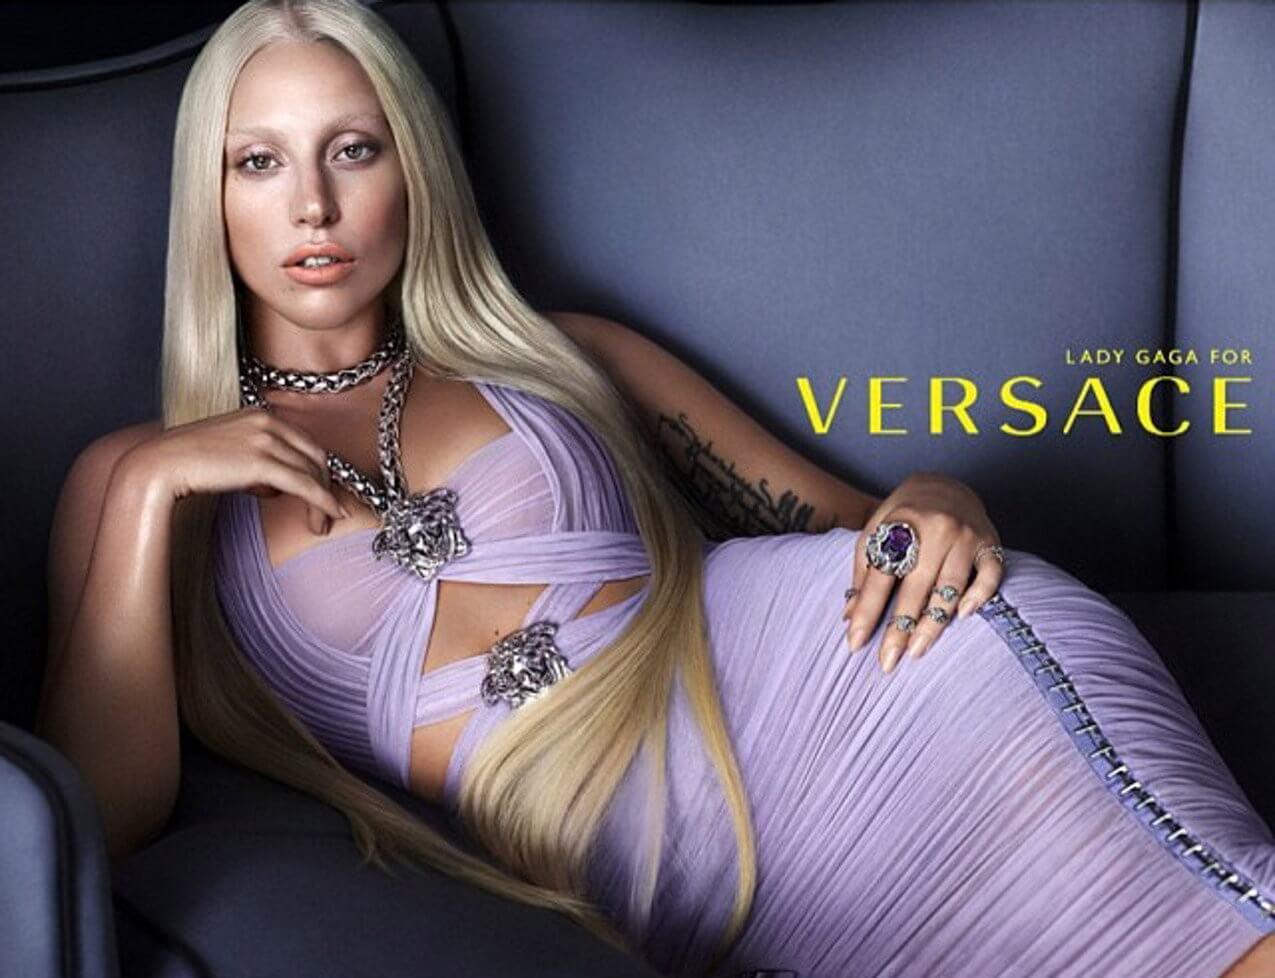 versace-lady-gaga